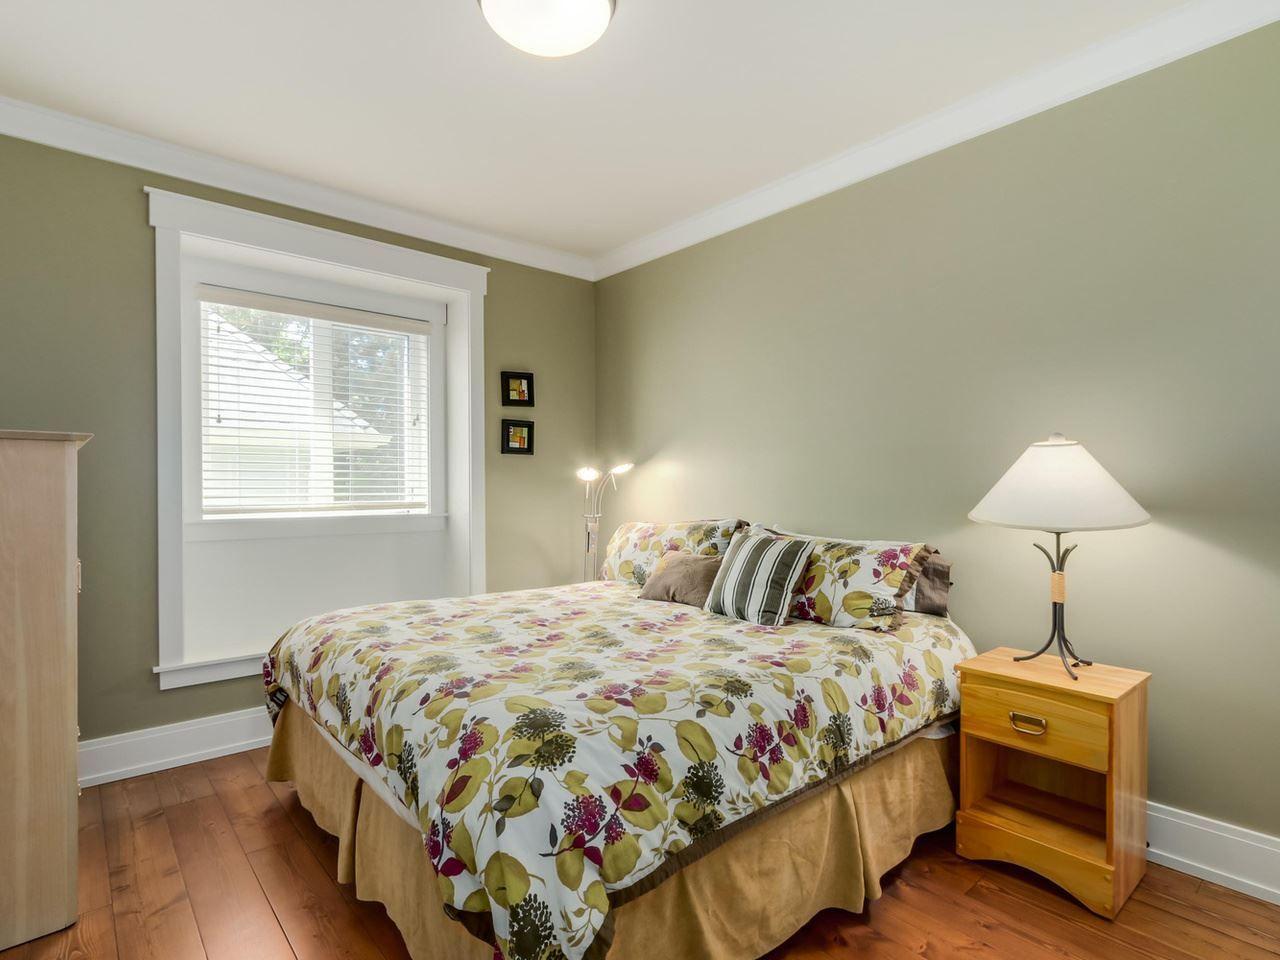 Photo 17: Photos: 13029 14 Avenue in Surrey: Crescent Bch Ocean Pk. House for sale (South Surrey White Rock)  : MLS®# R2070160